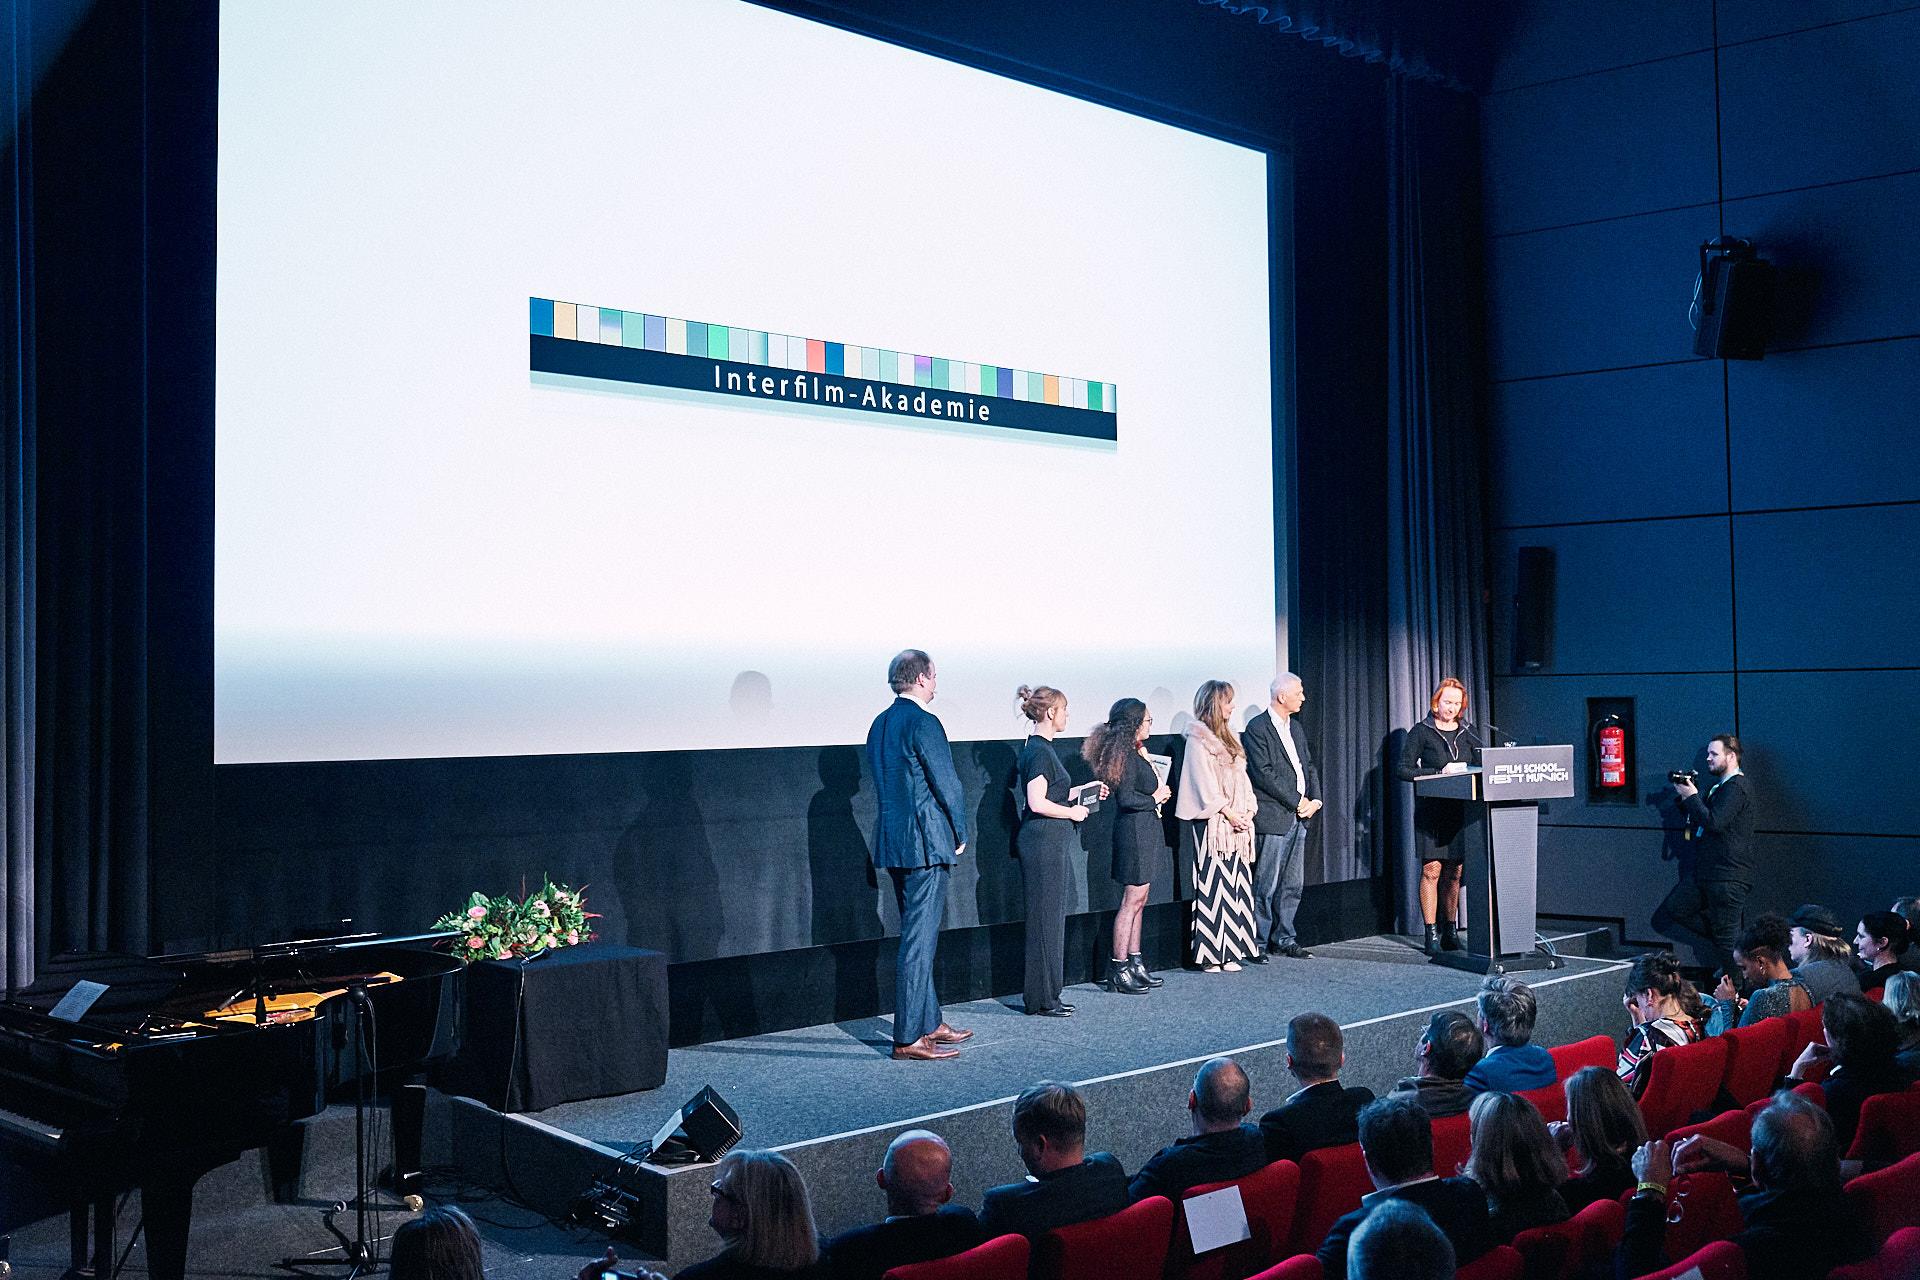 Prix Interculturel 2019 - Preisverleihung 1